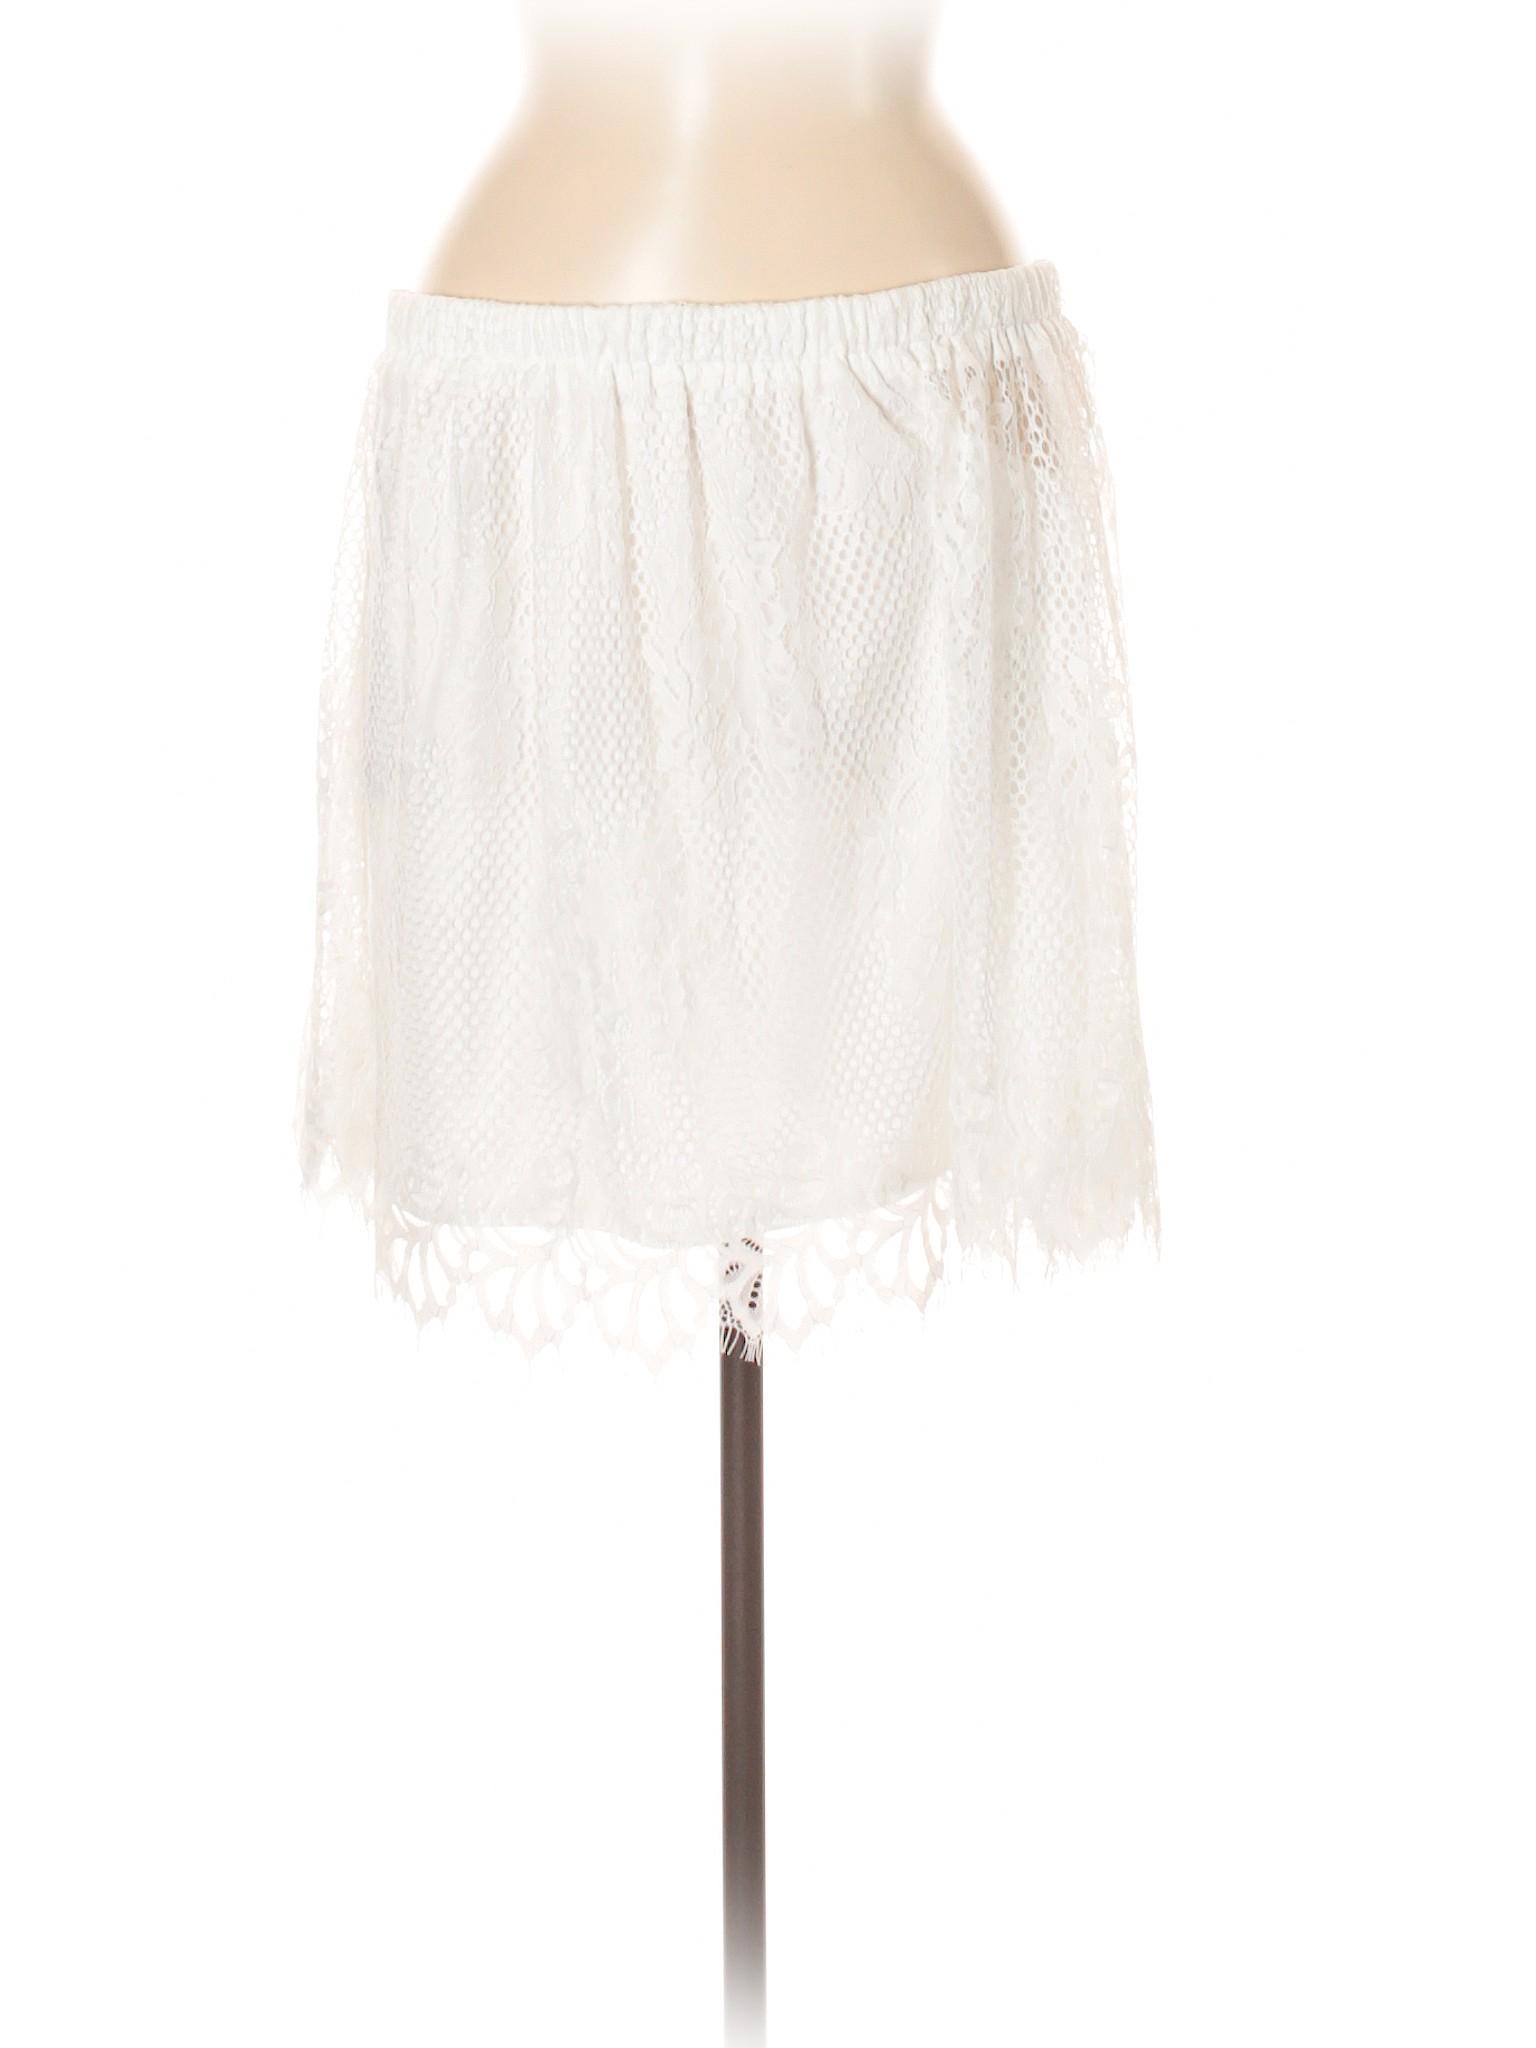 Boutique Ciel leisure Casual Skirt Bleu r7rHU